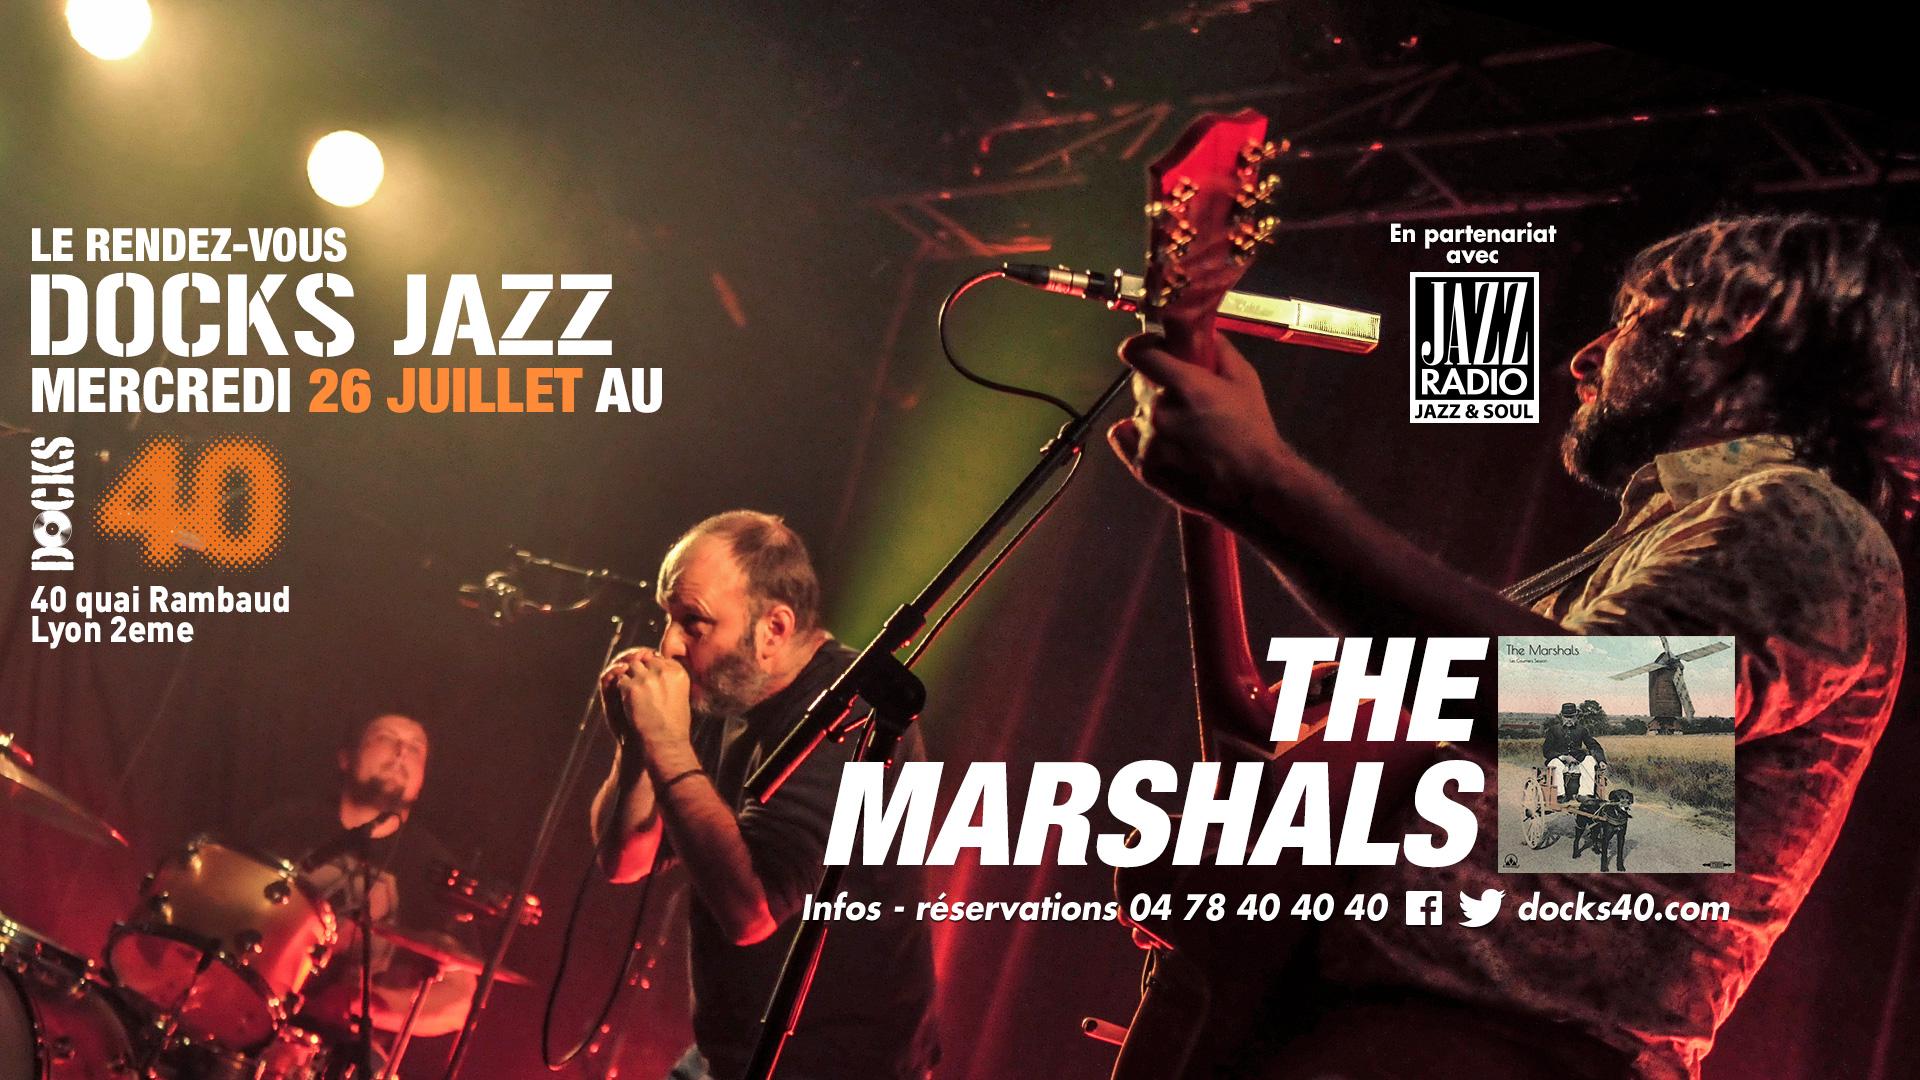 Mercredi Docks Jazz - THE MARSHALS